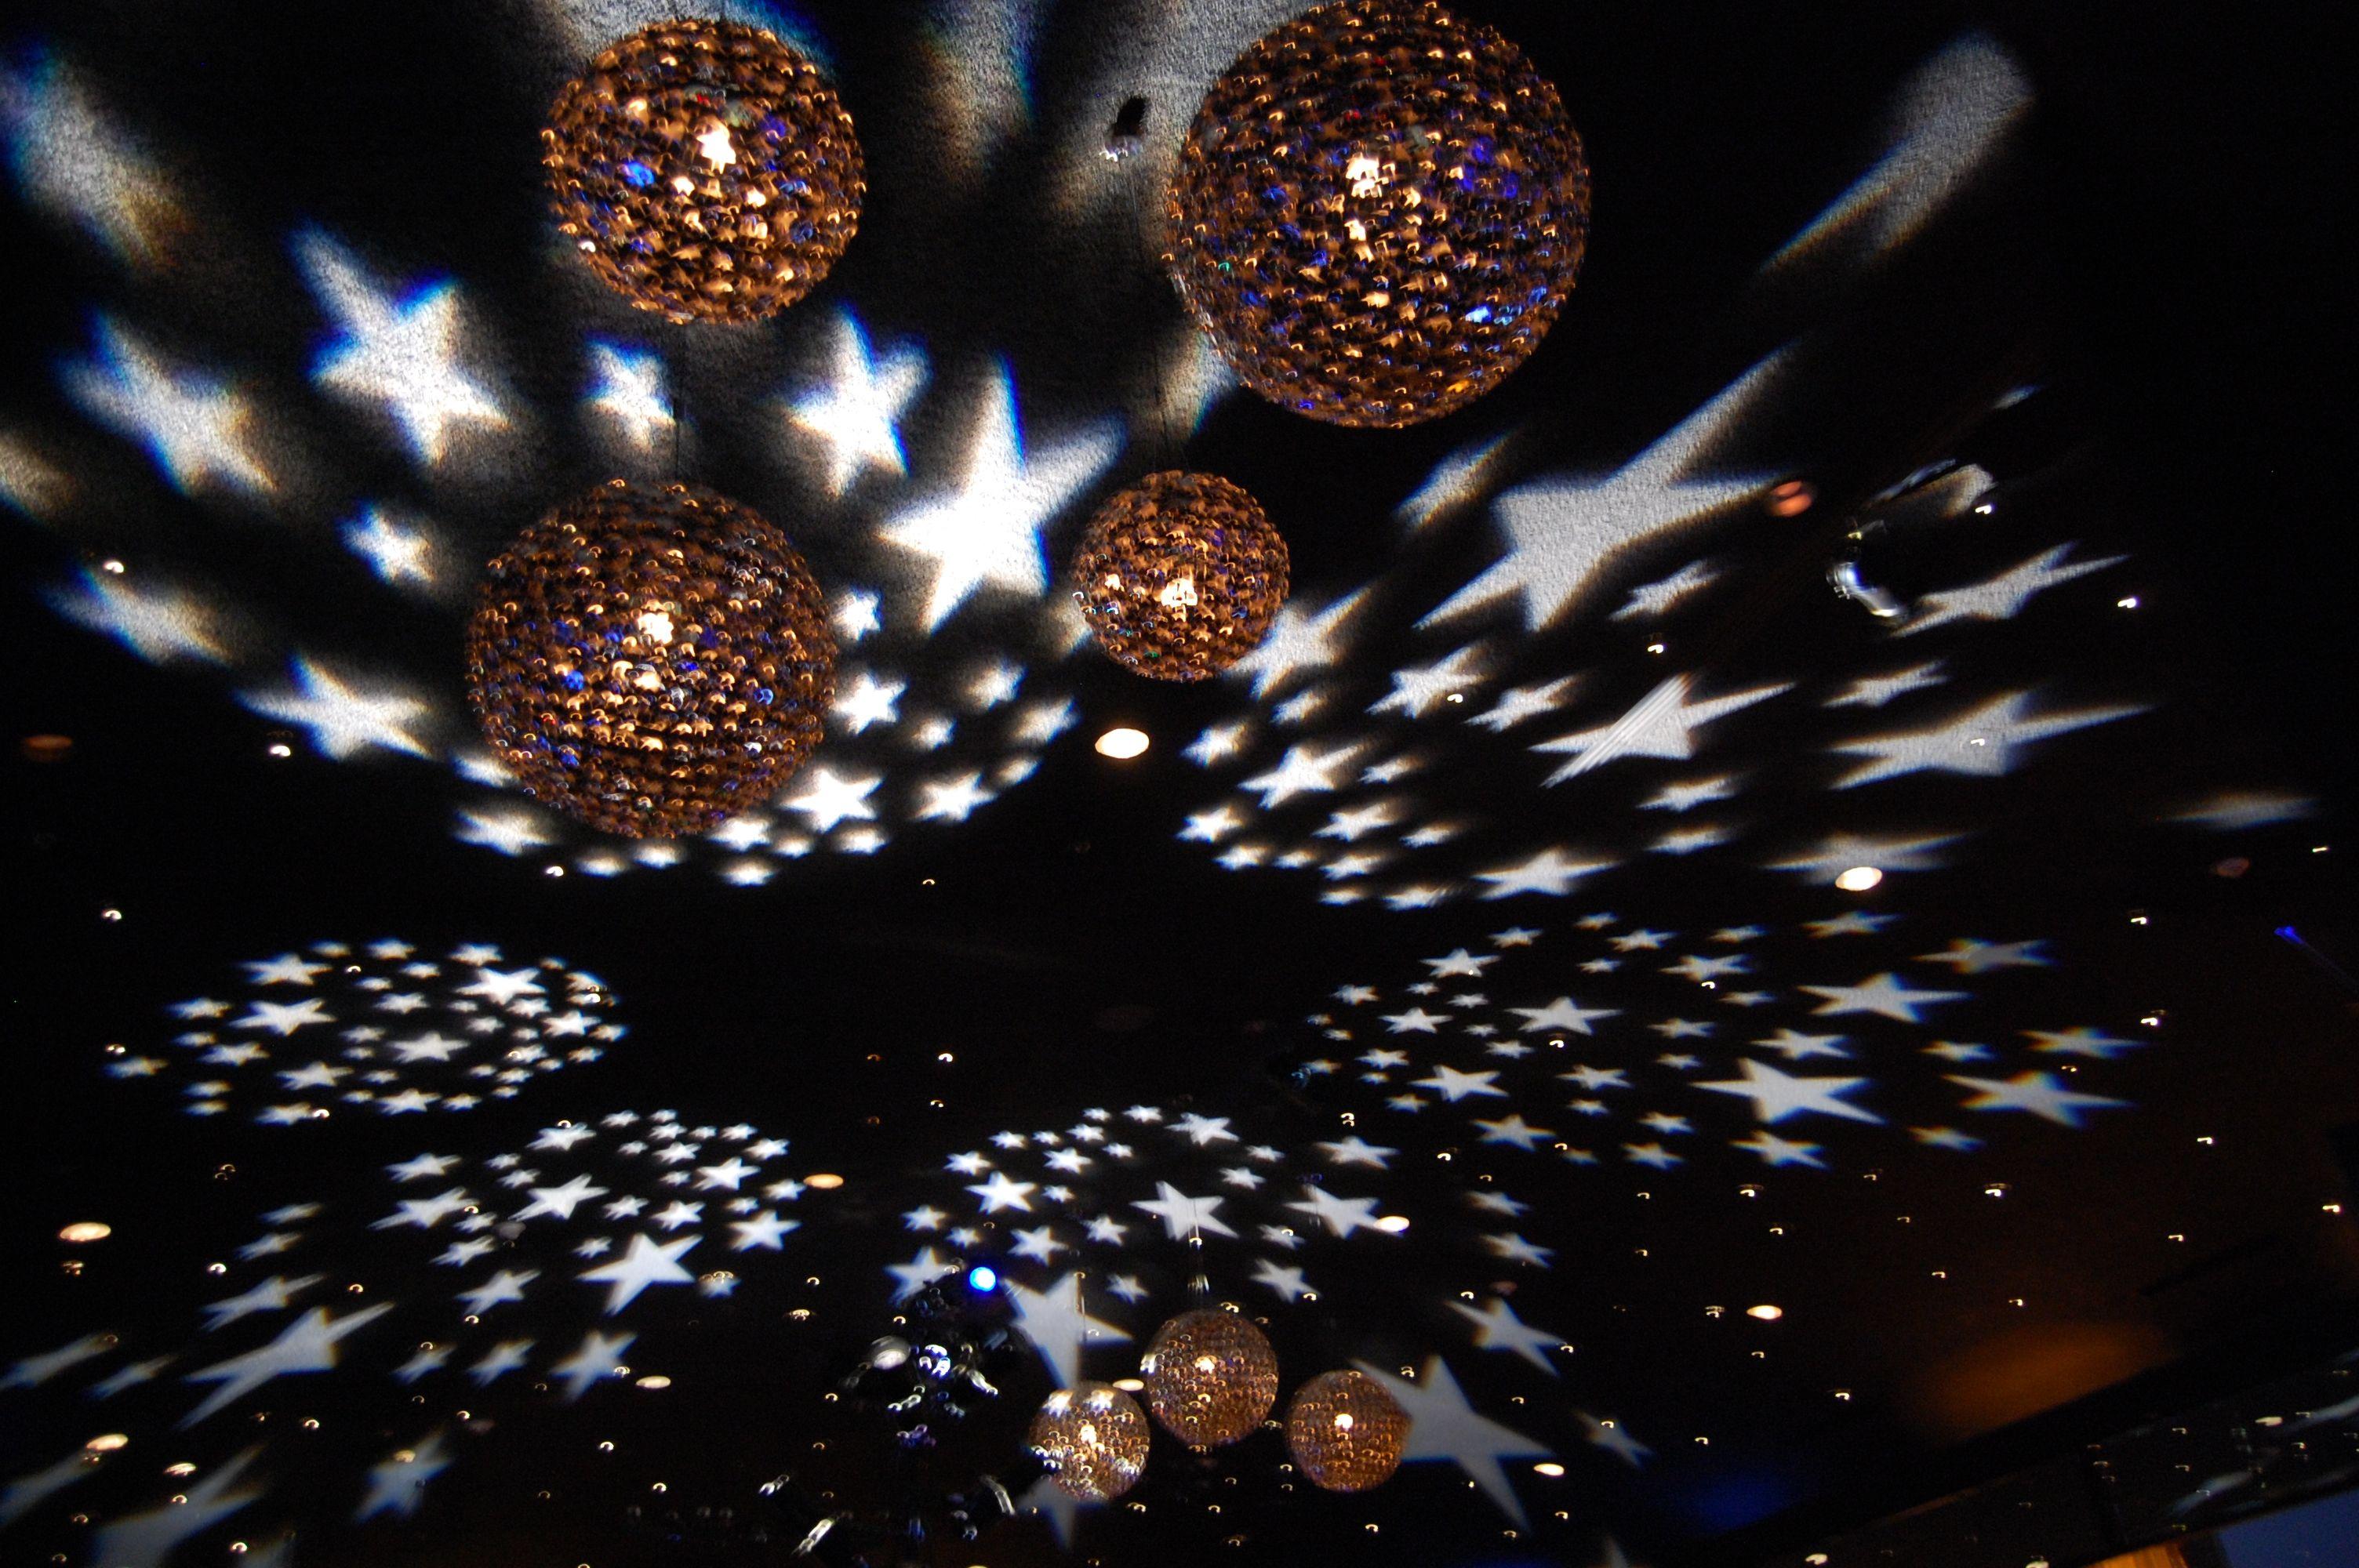 Starry night - Corporate event - bar bat mitzvah - Sweet 16 - Ceiling lighting - Stars - Lighting design - DB Creativity - laura@dbcreativity.com